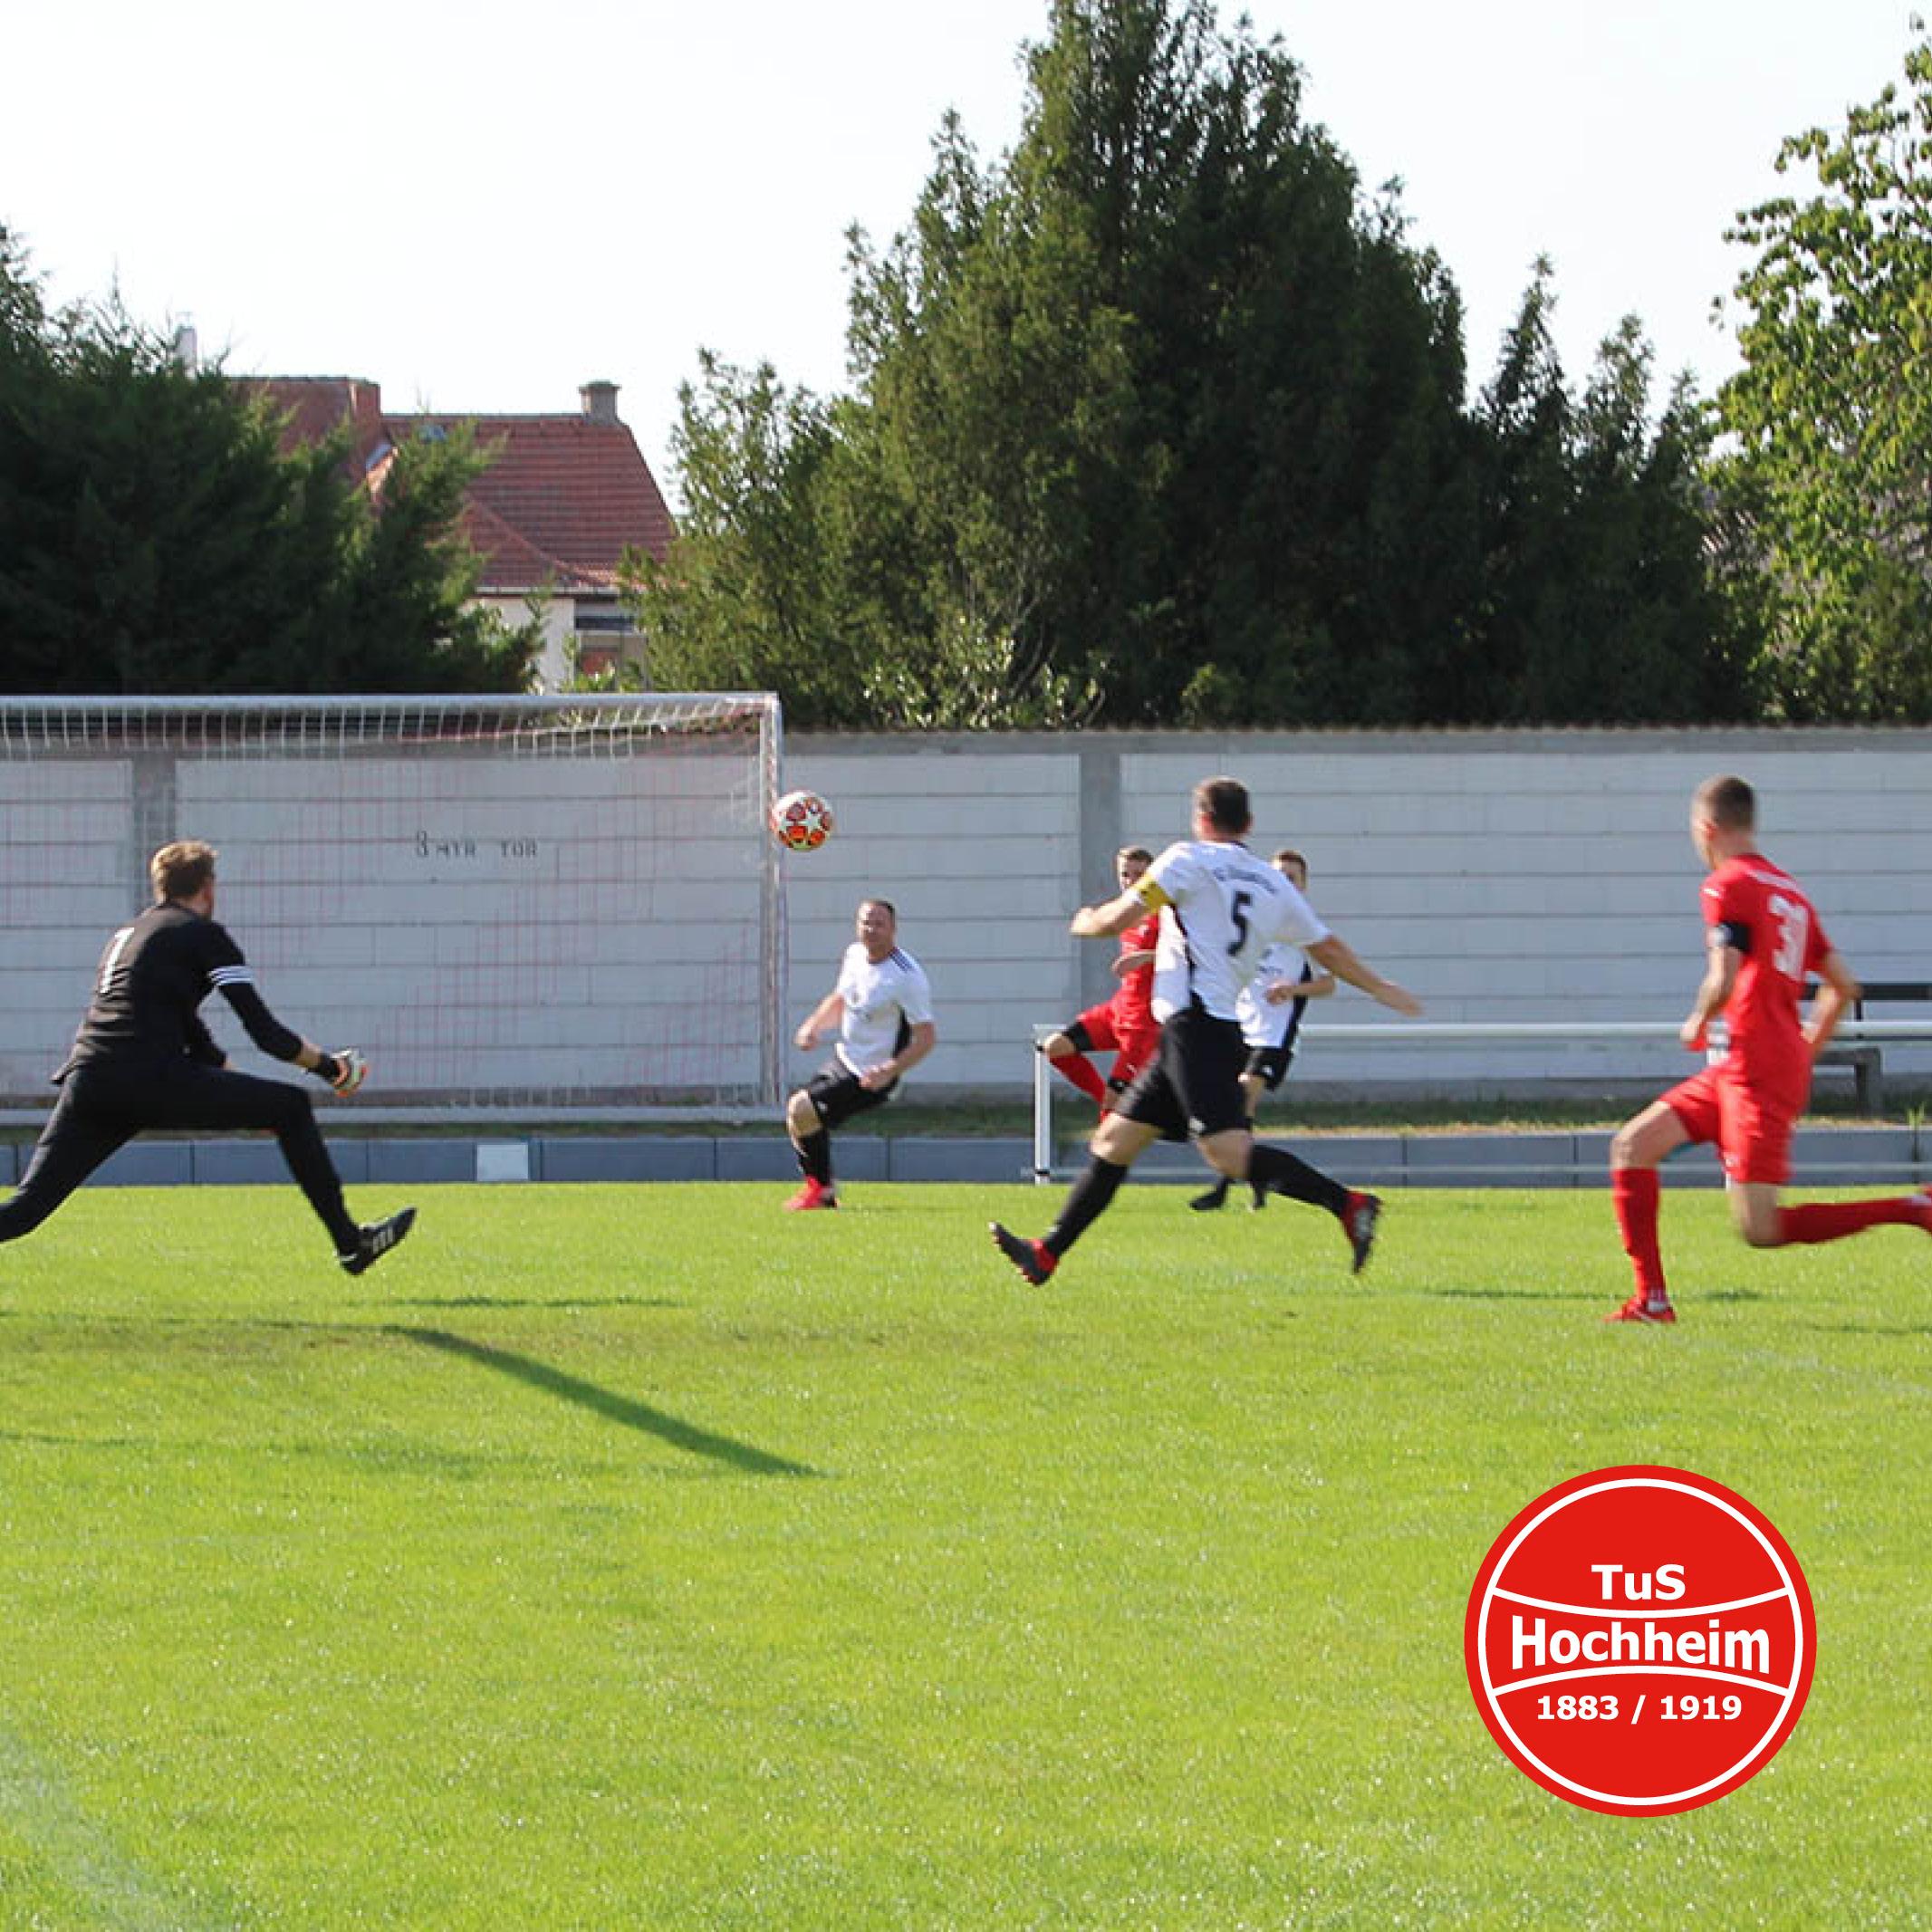 TuS Hochheim vs SG Eisbachtal